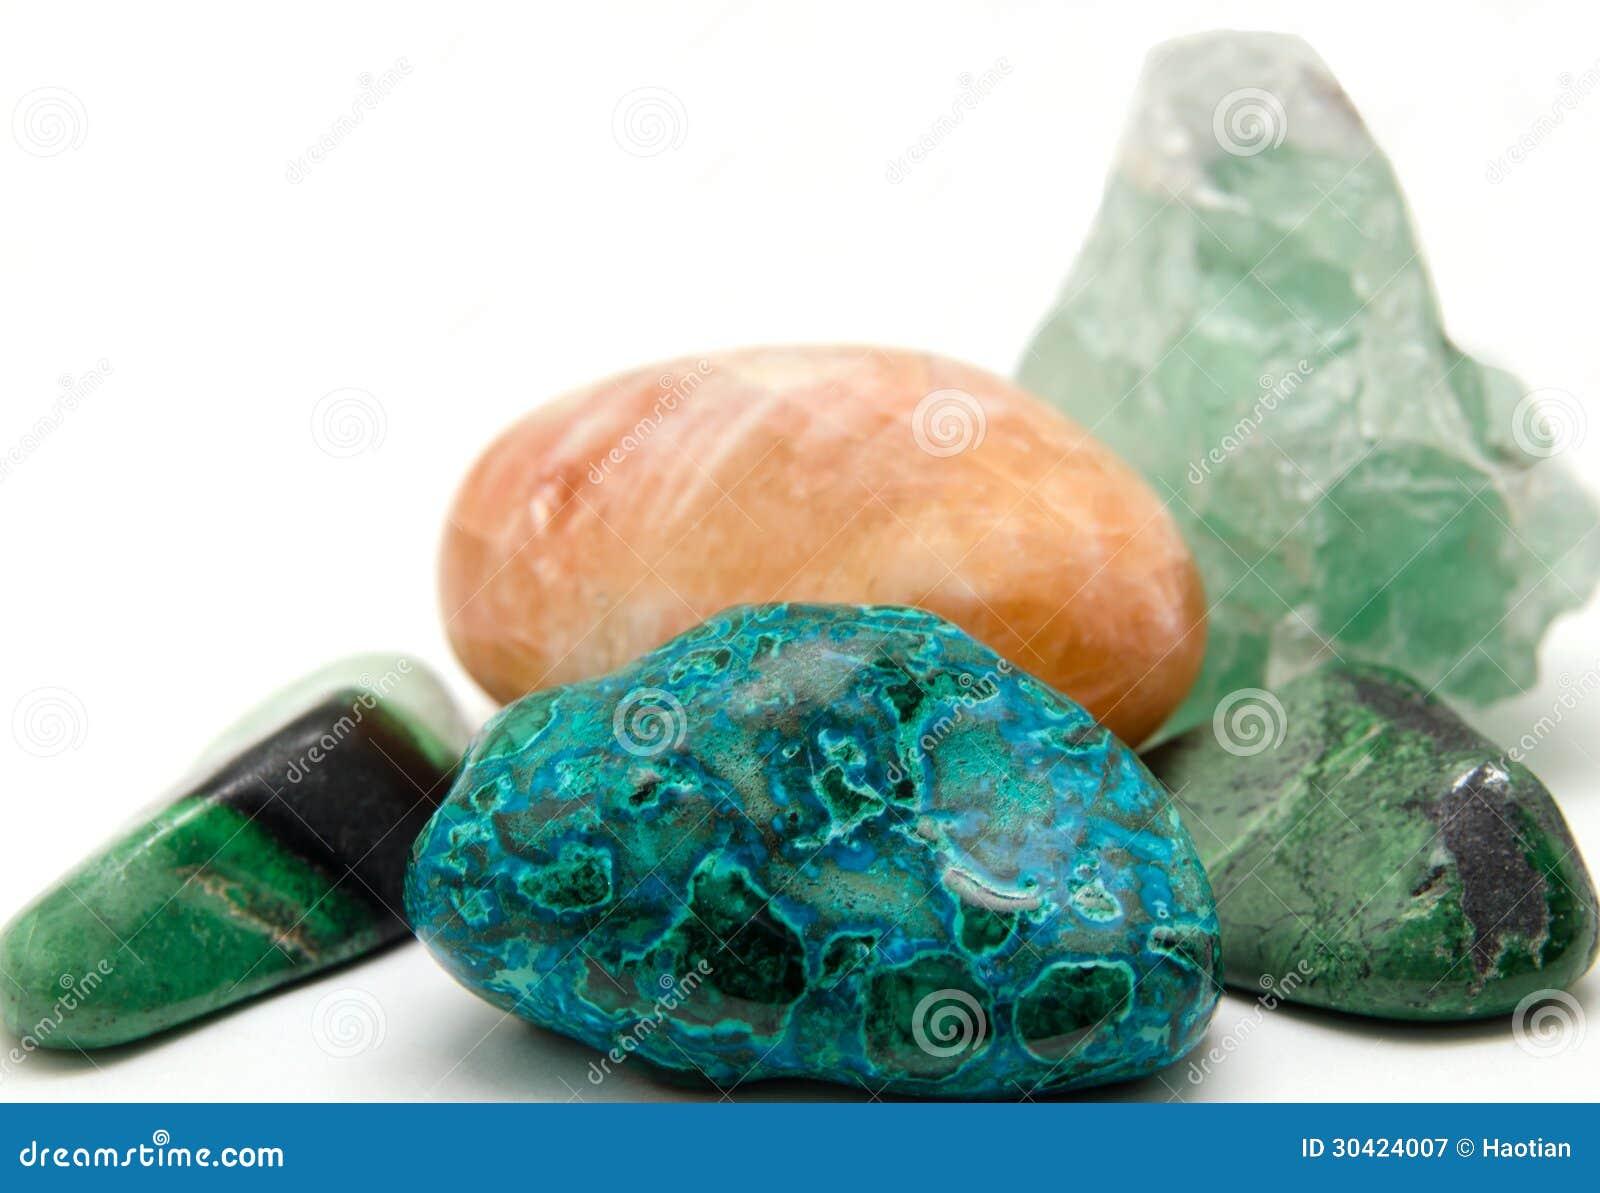 Różnorodne kopaliny i kryształy